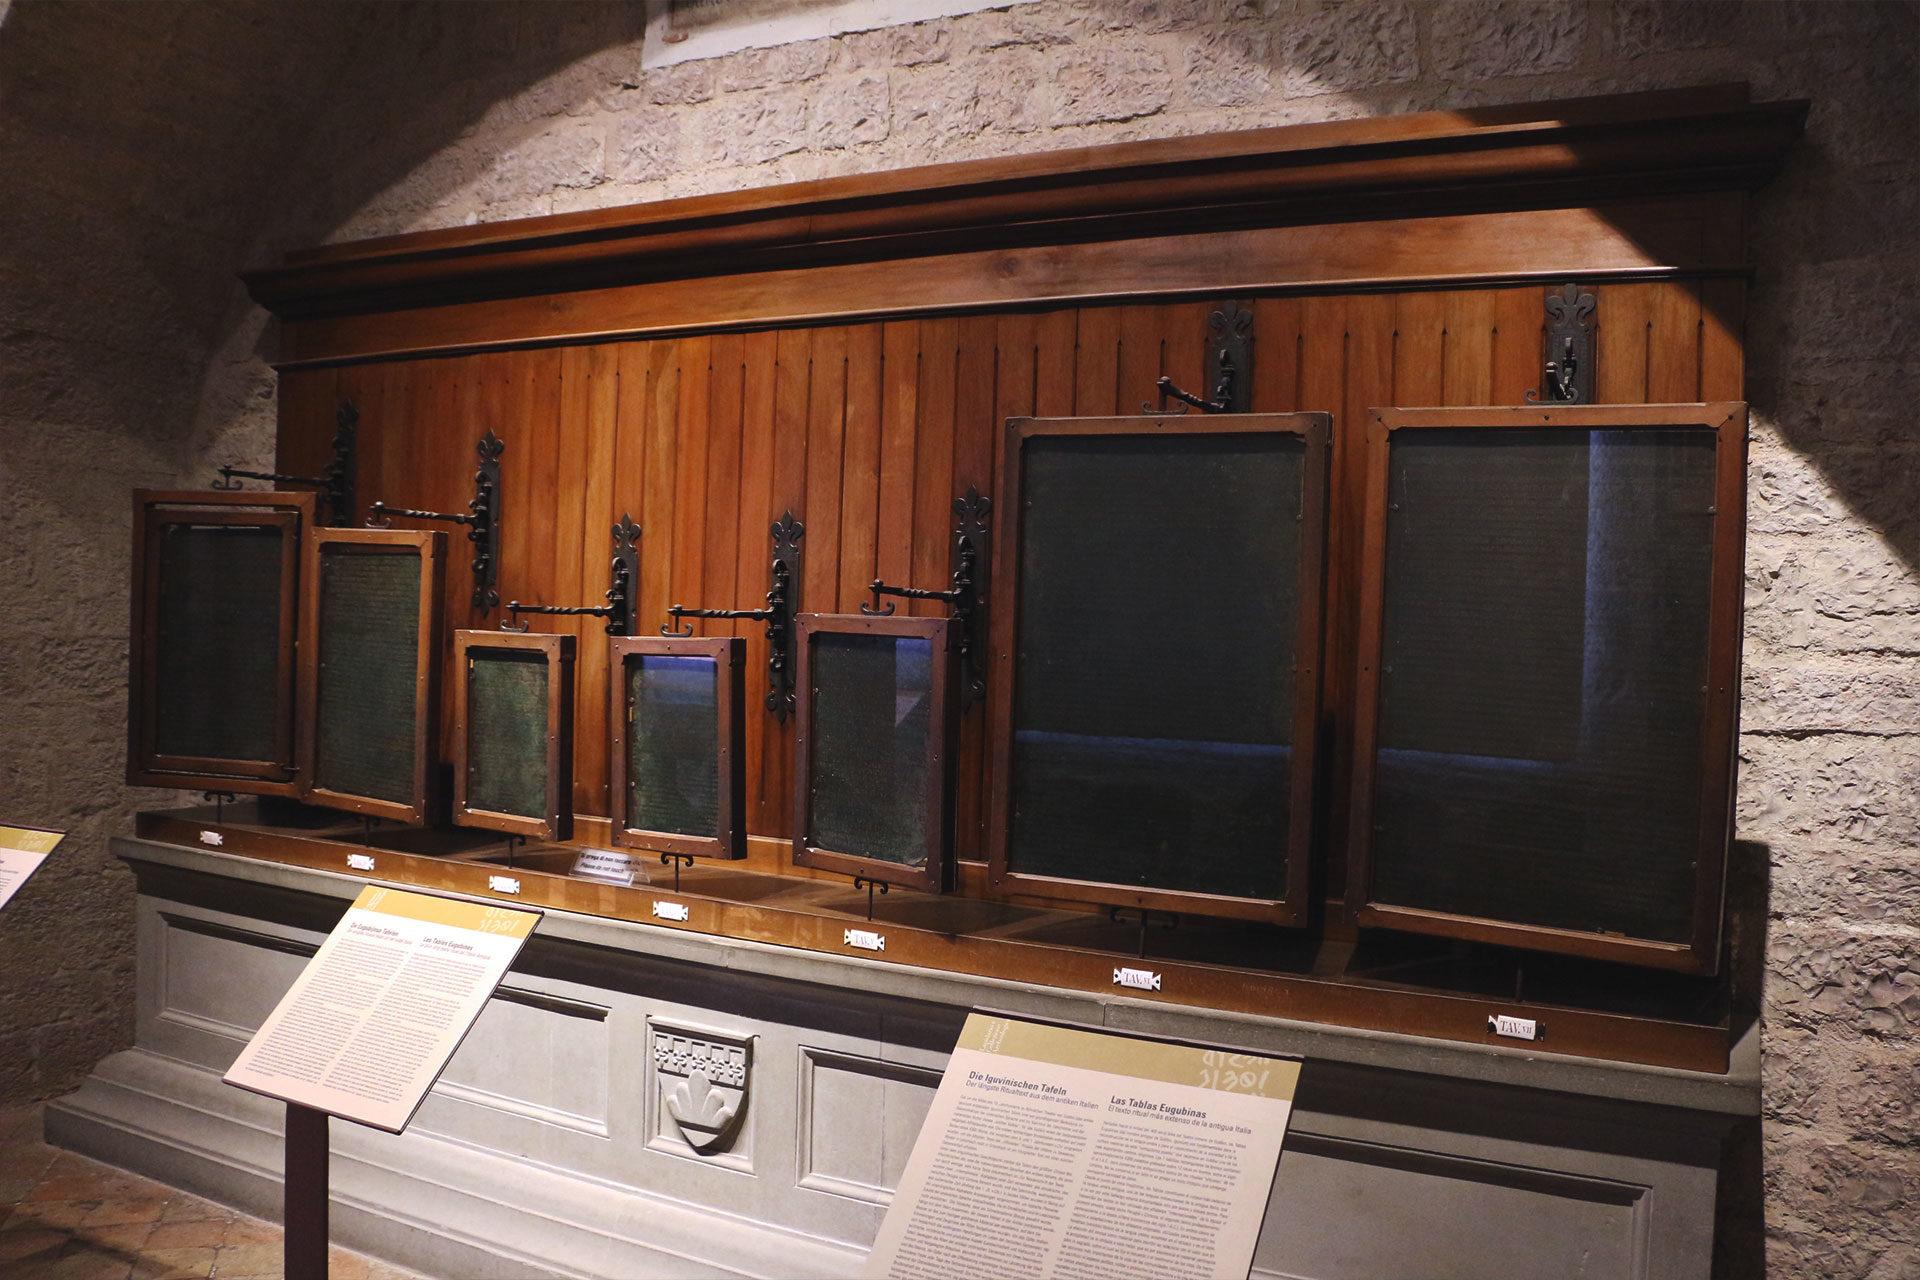 tavole-eugubine - Gubbio - Ancient Umbrians Eugubian Tablets - Eugubian Tablets